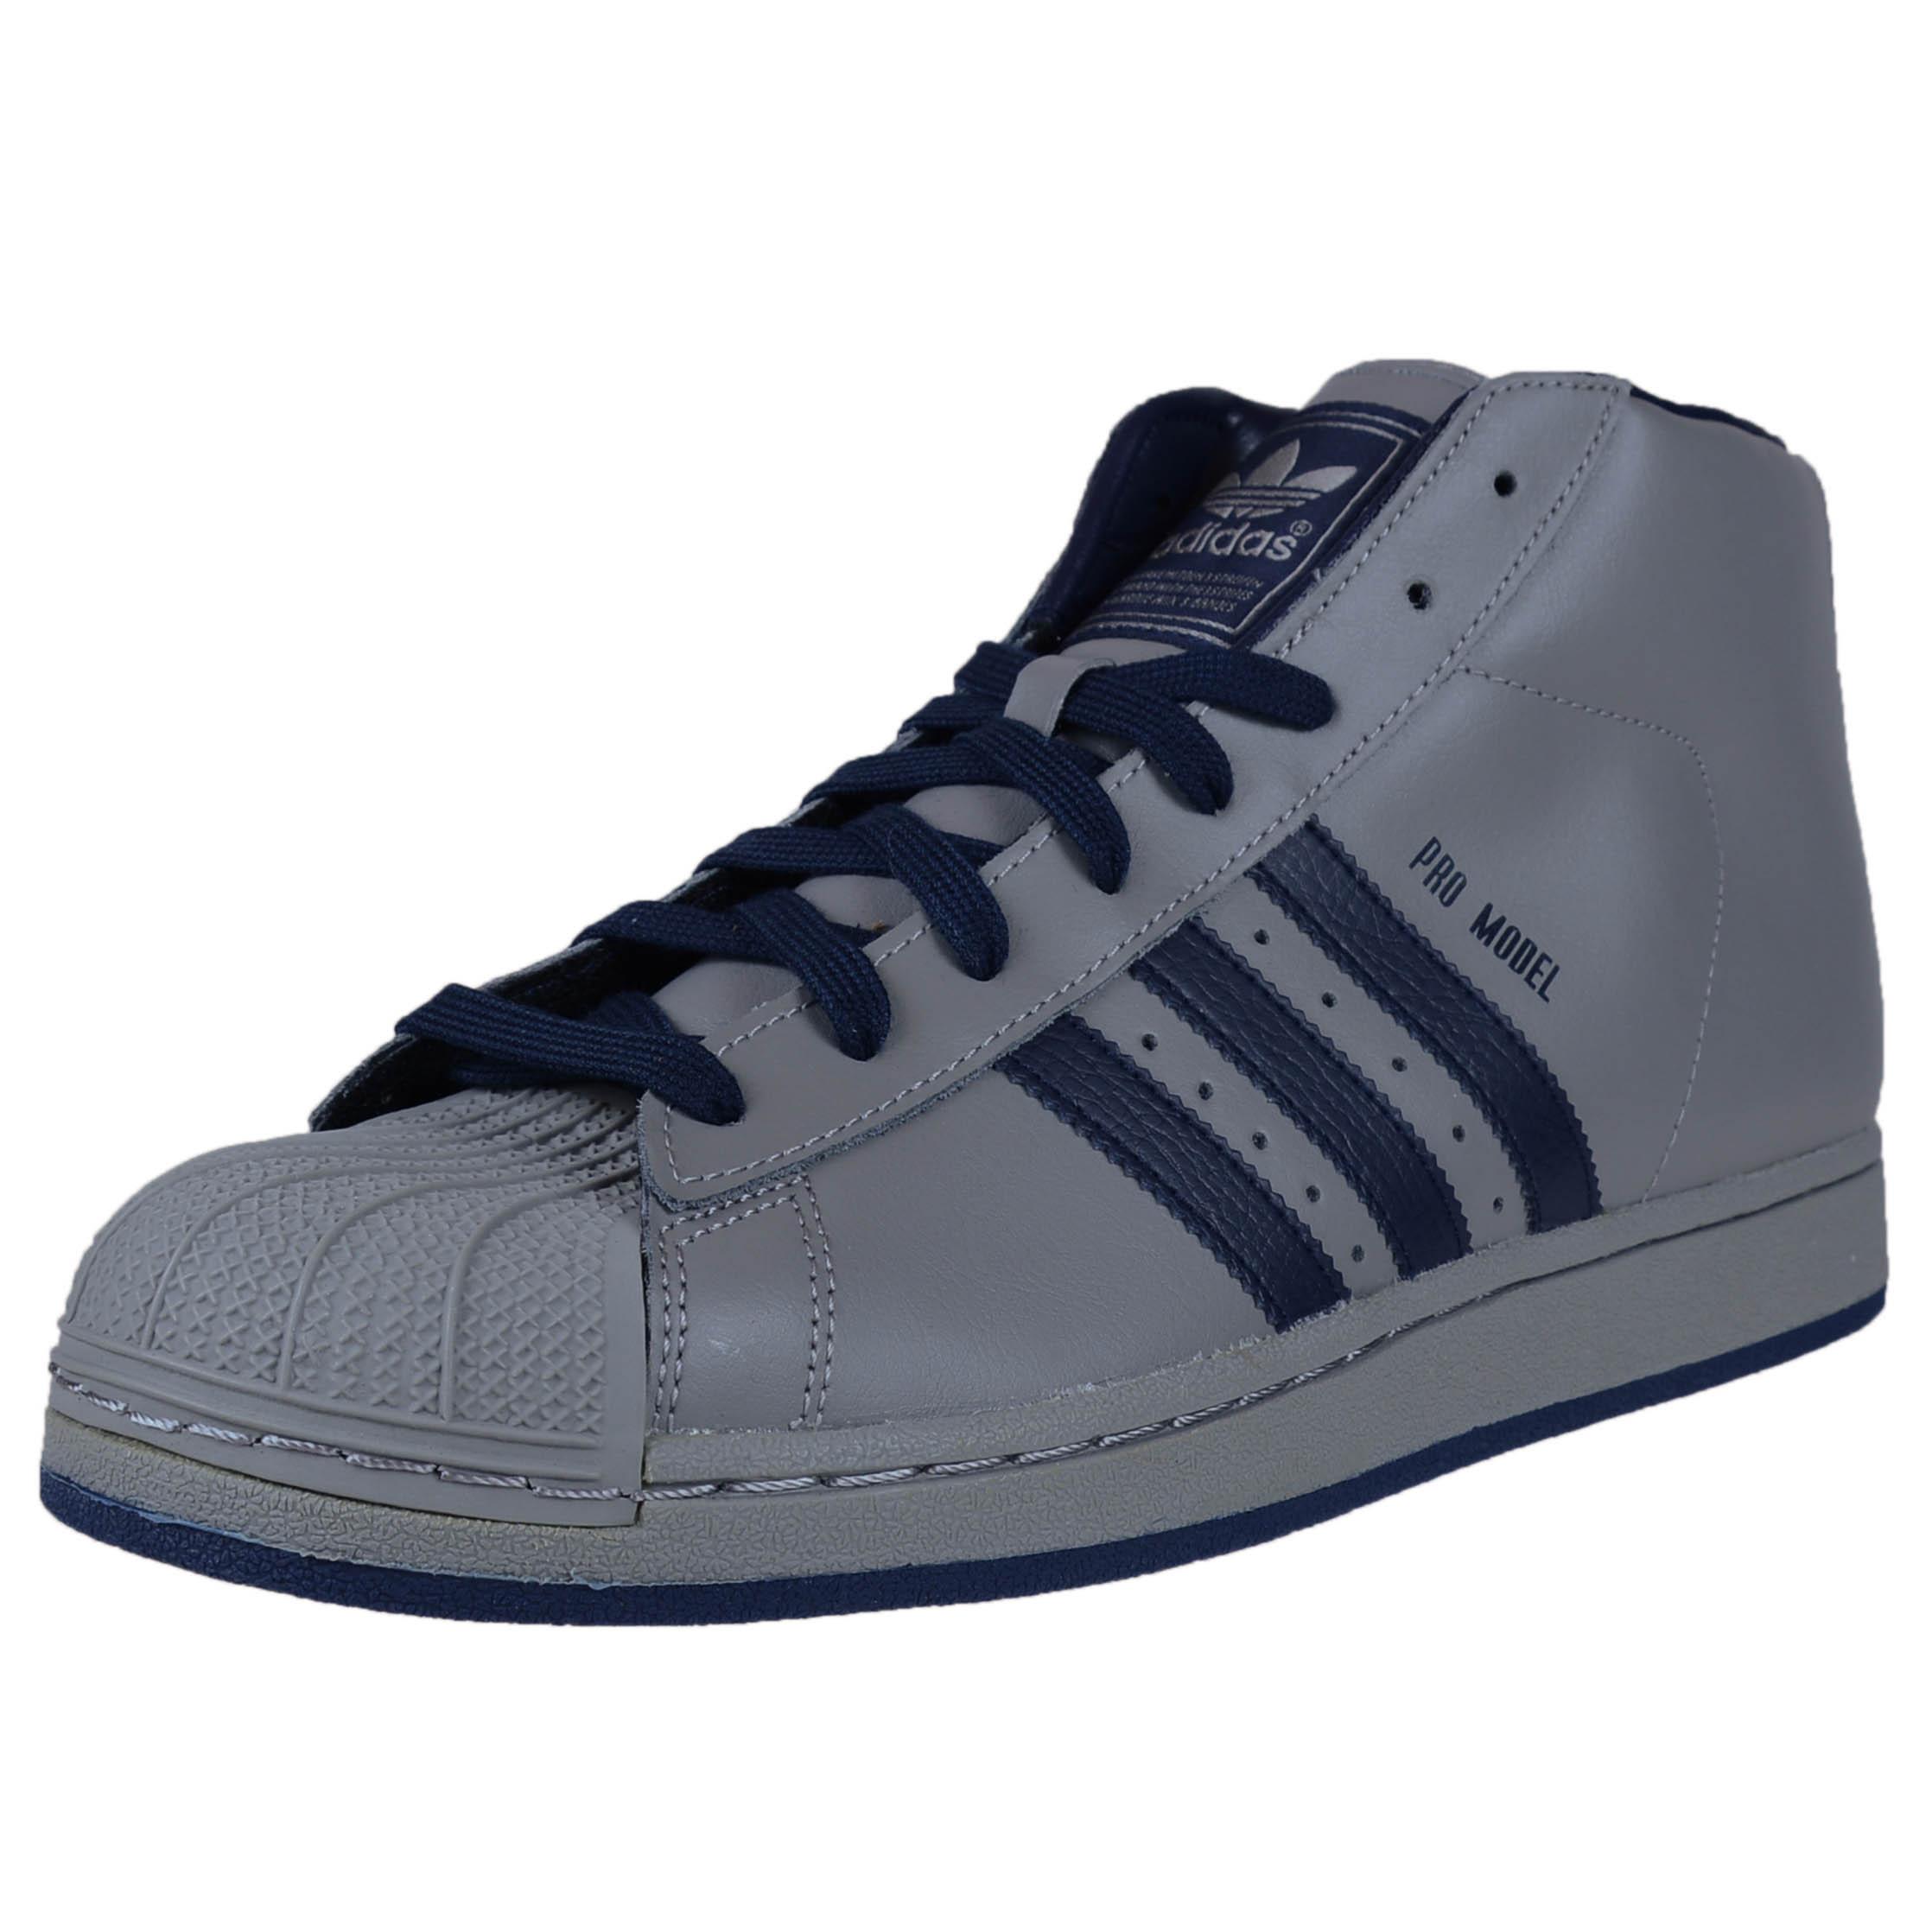 adidas Pro Model Basketball Shoes for Men | eBay